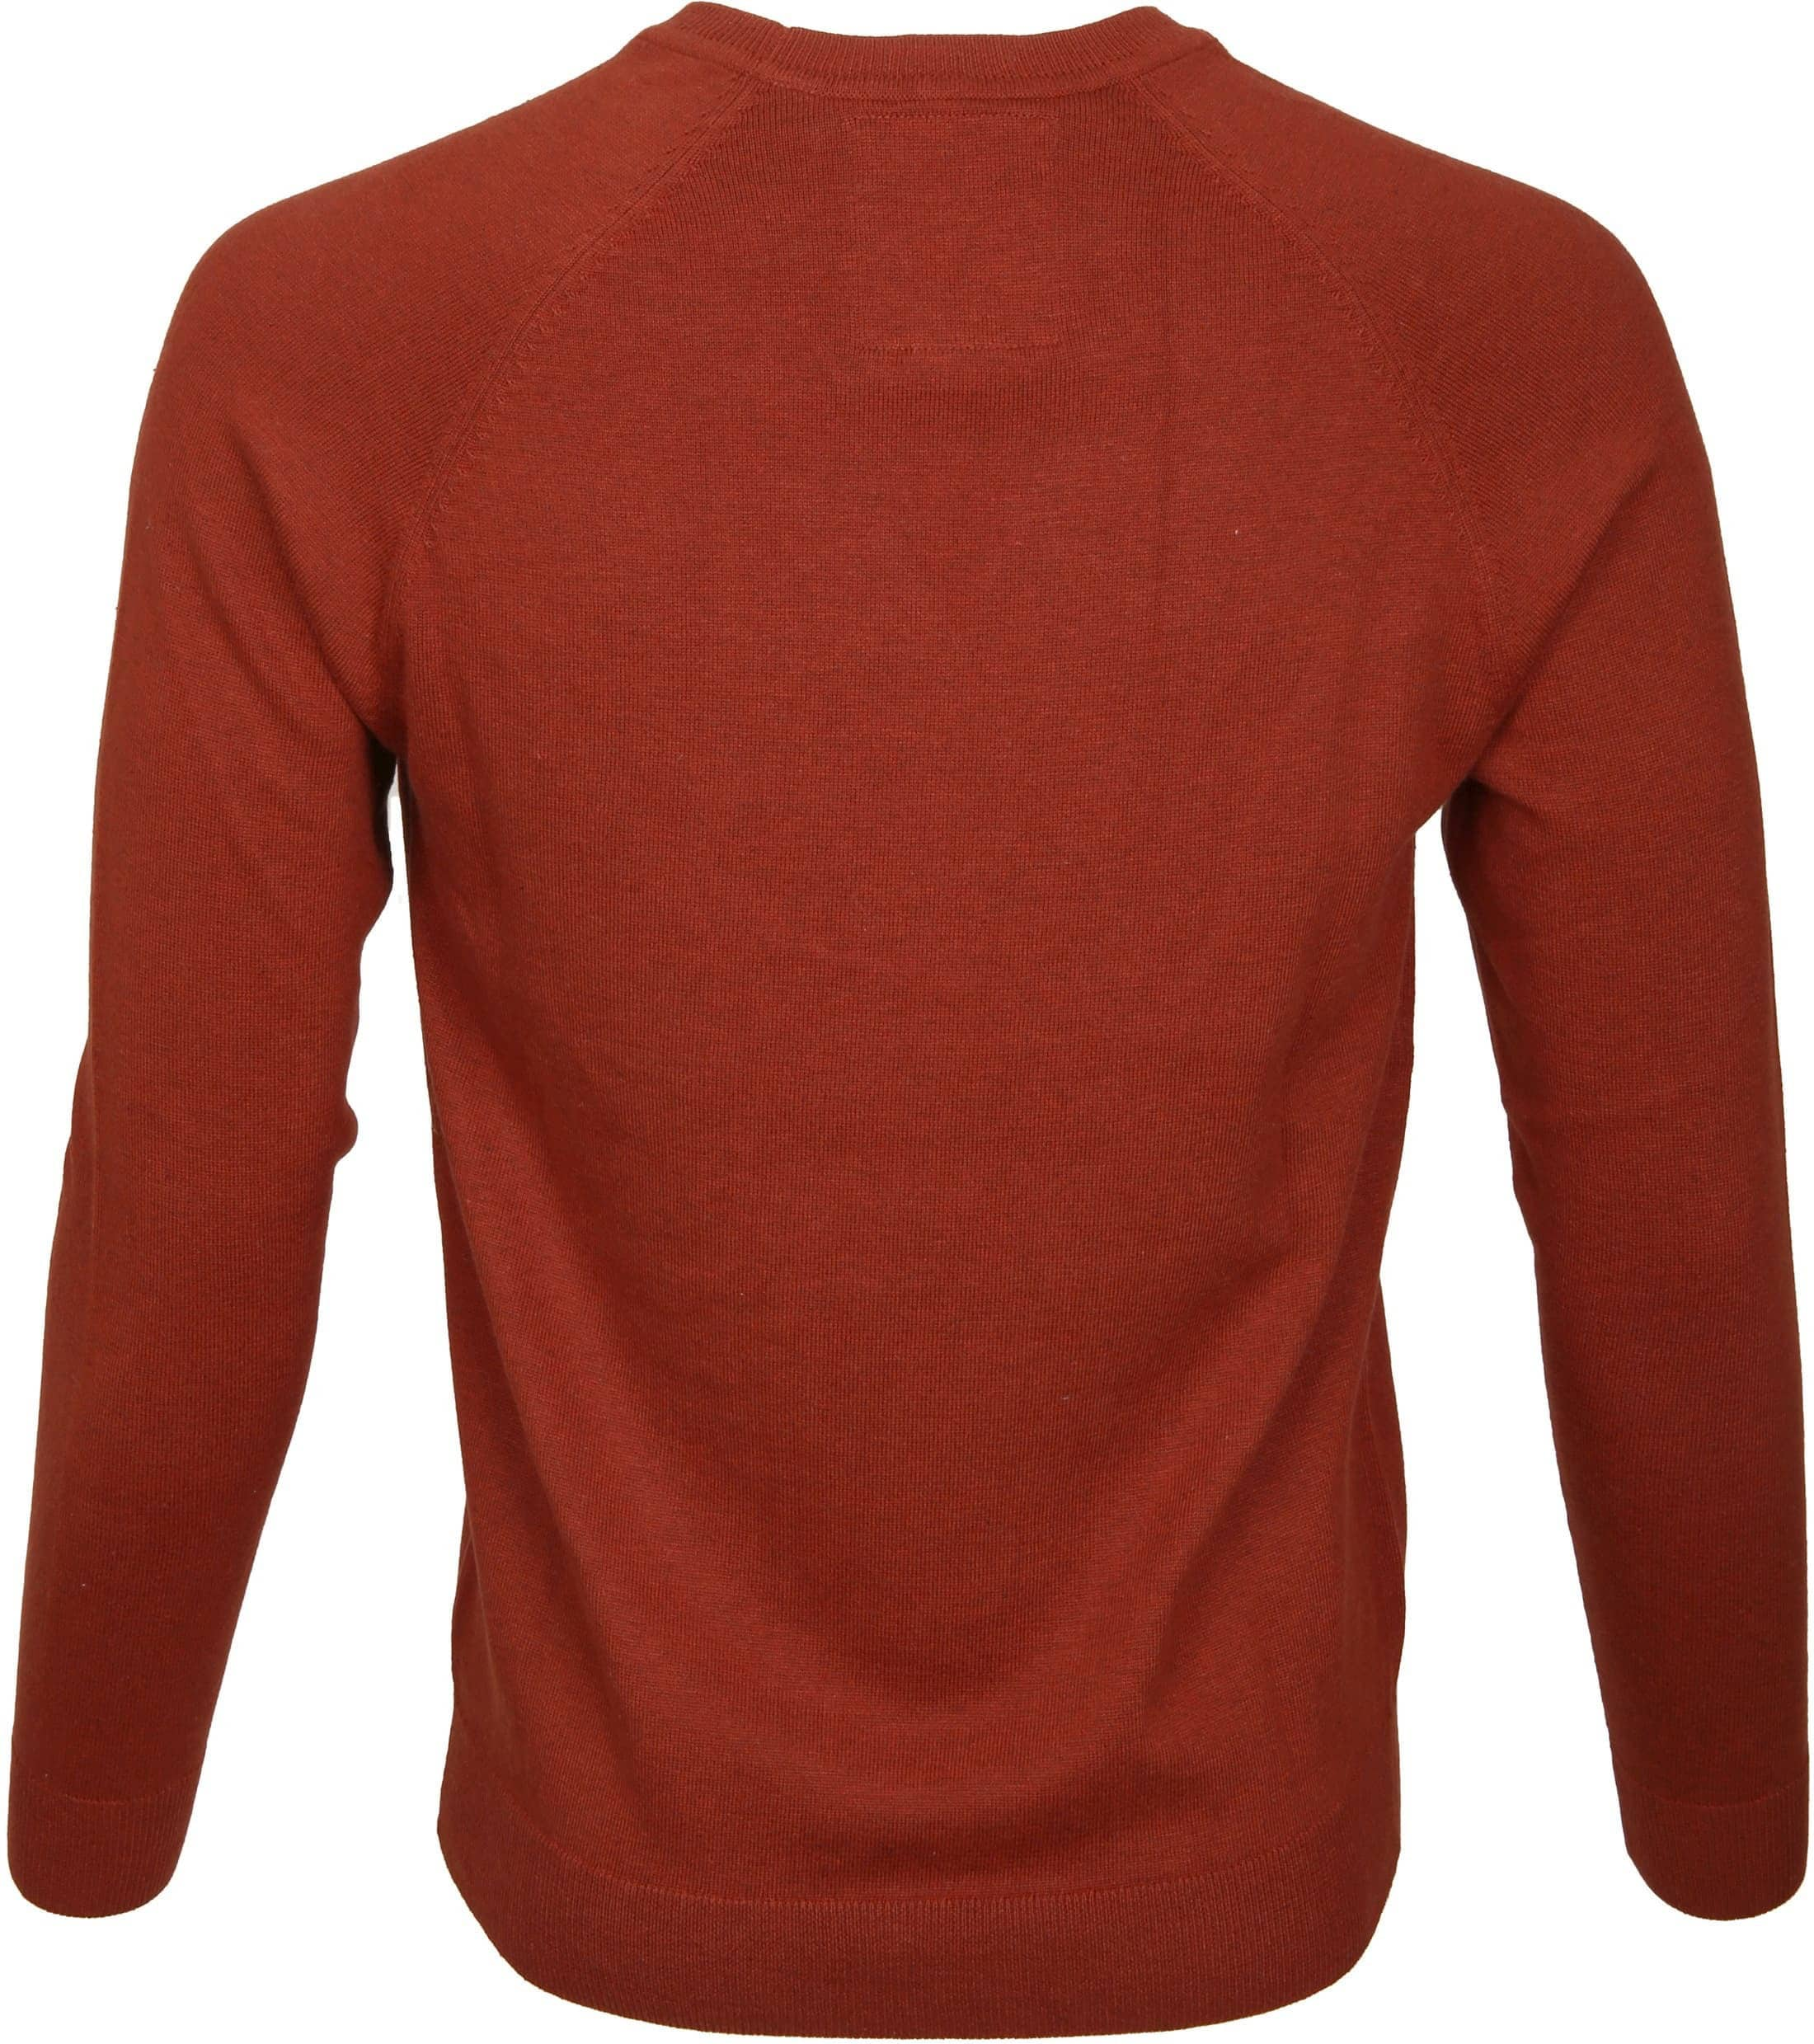 Superdry Sweater Melange Rood Oranje foto 2